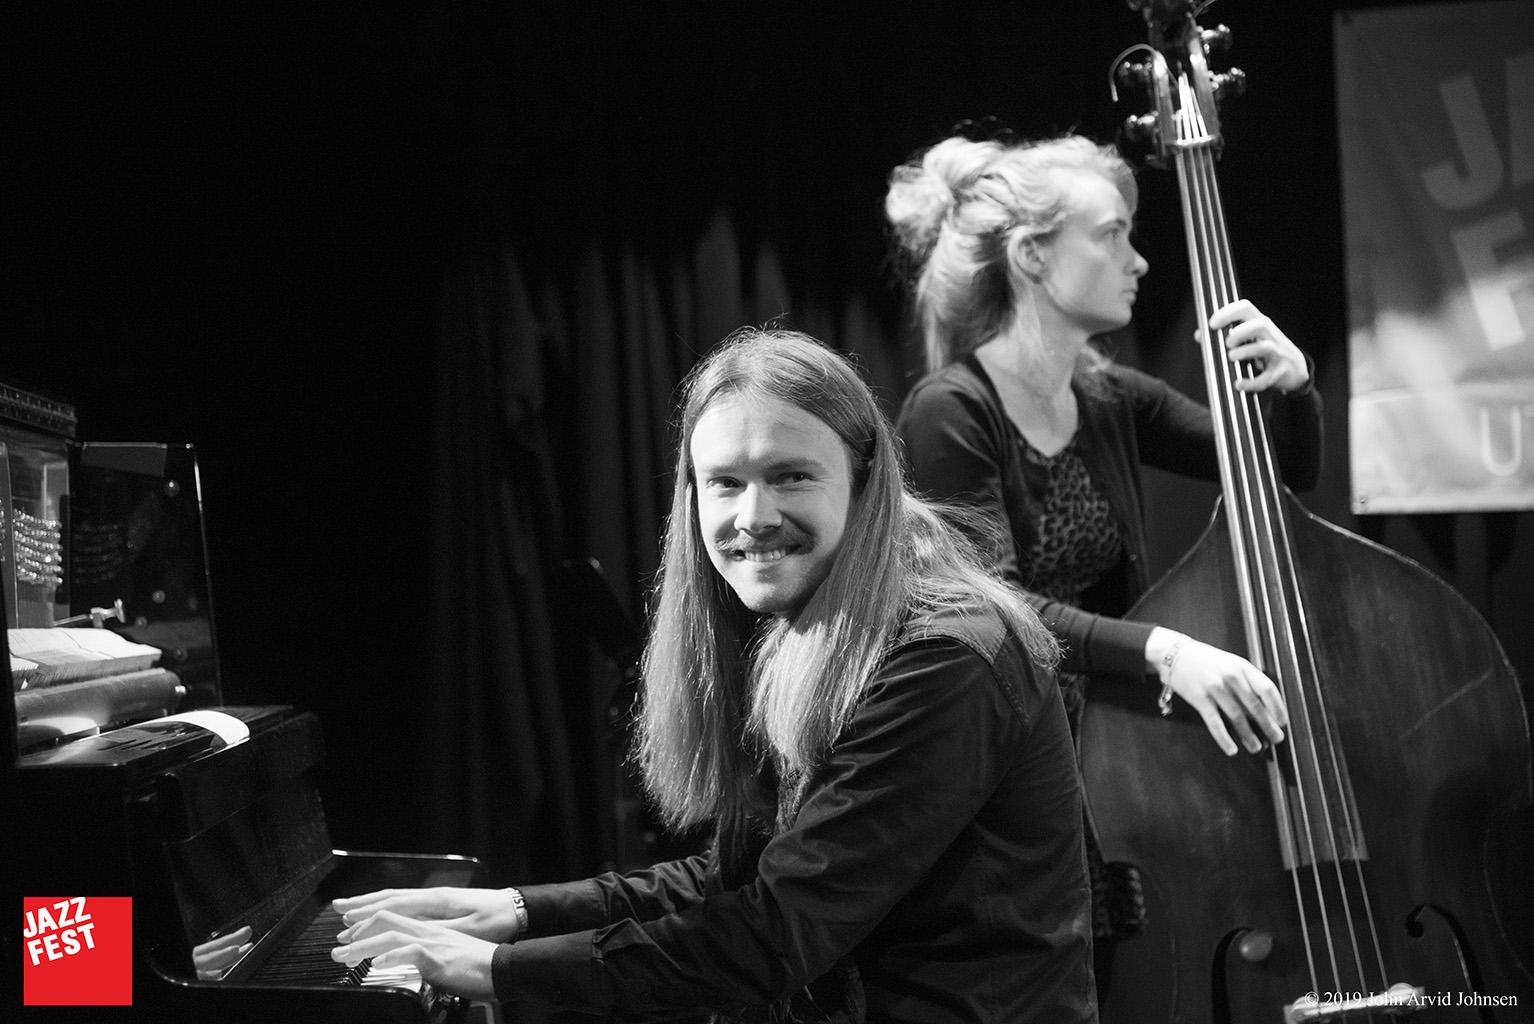 190511 Jazzfest Ung @ Isak Kultursenter (foto John Arvid Johnsen) _ 8.jpg